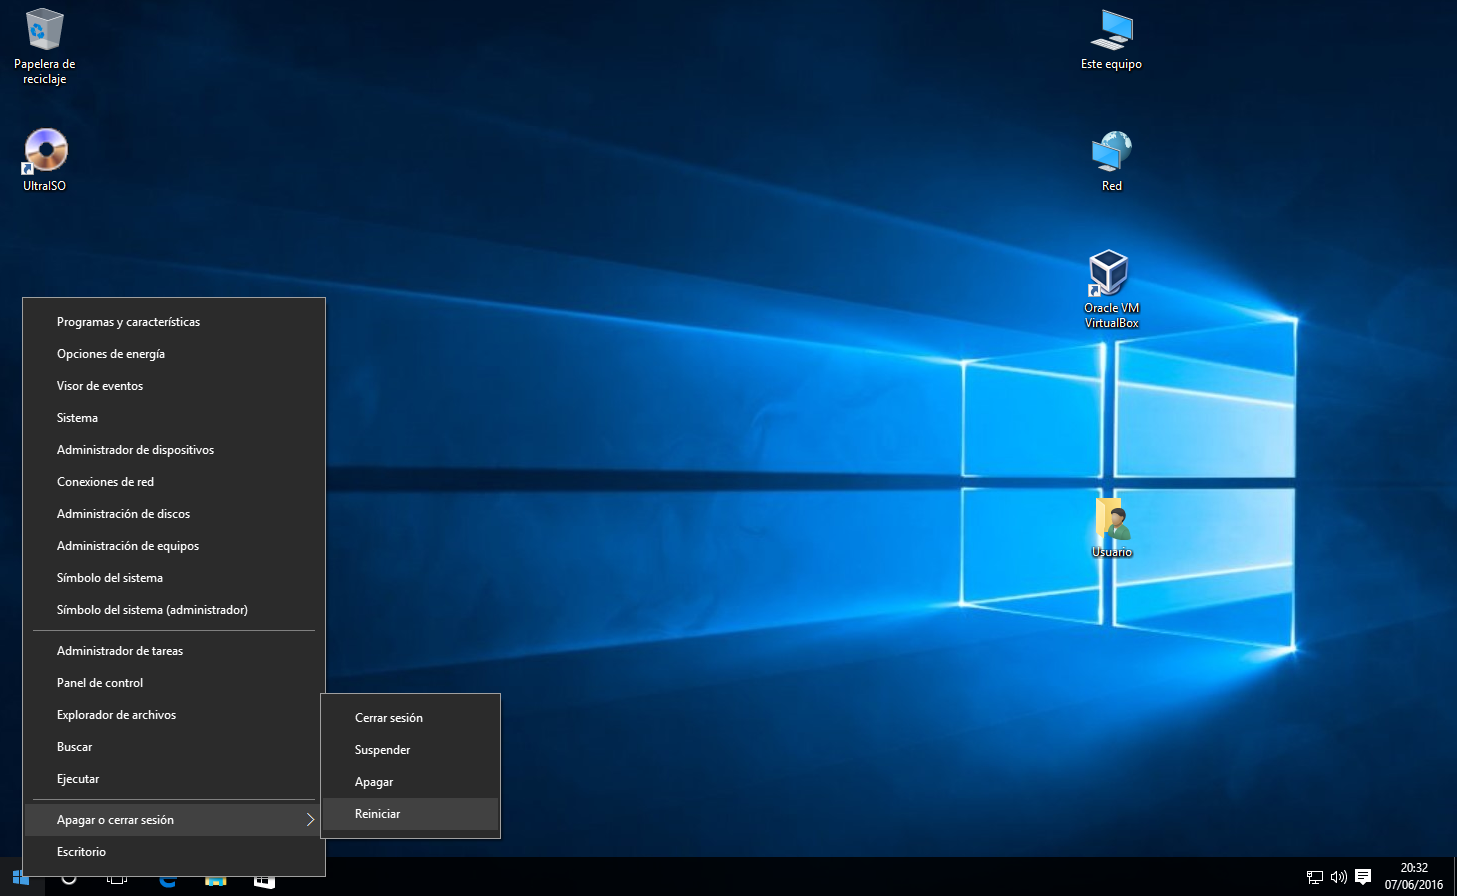 Reiniciar en Windows 10